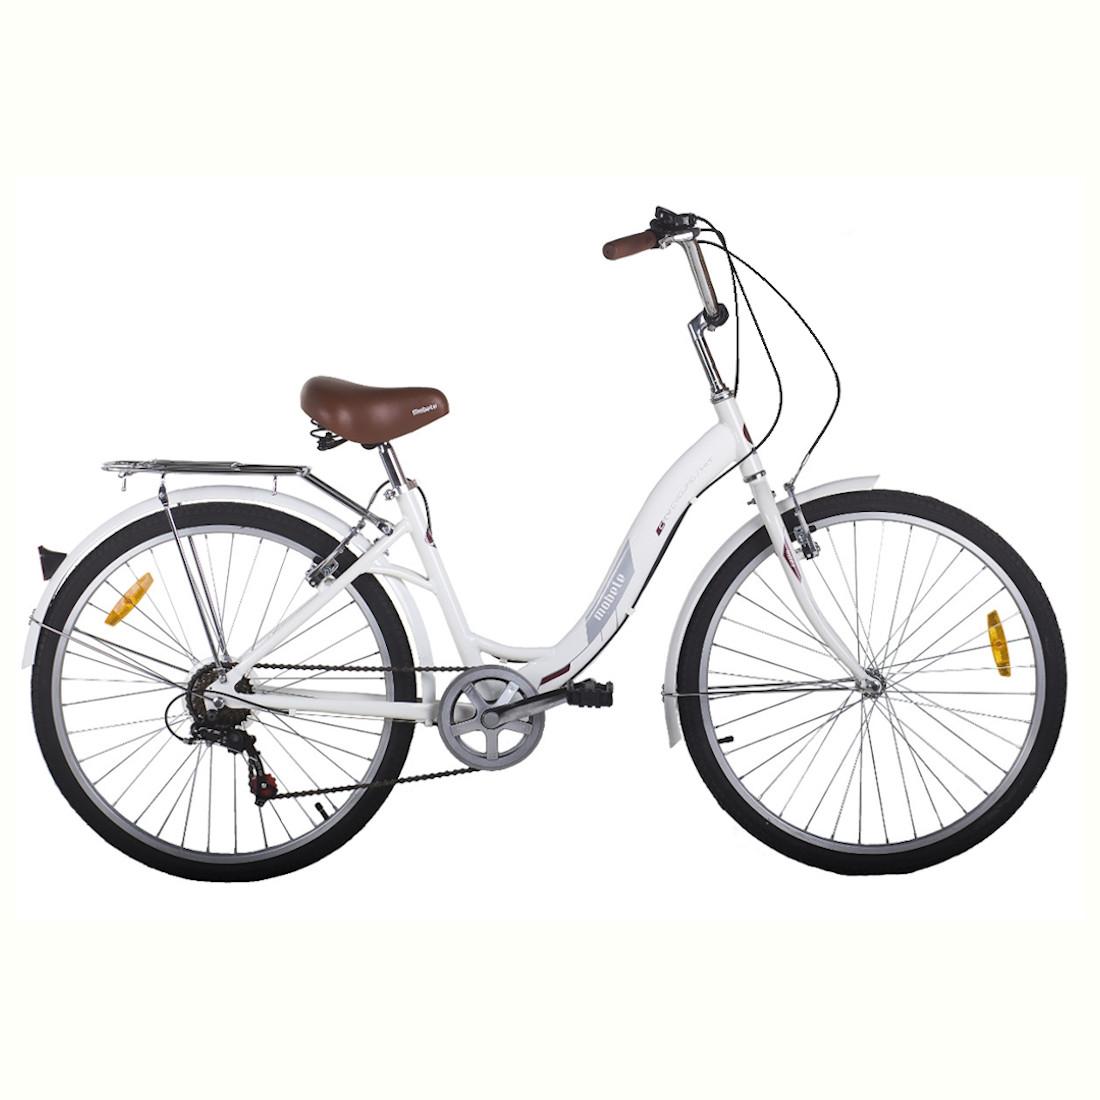 Bicicleta Vintage Retrô Aro 26 Alumínio 7V Branca Hit City Mobele